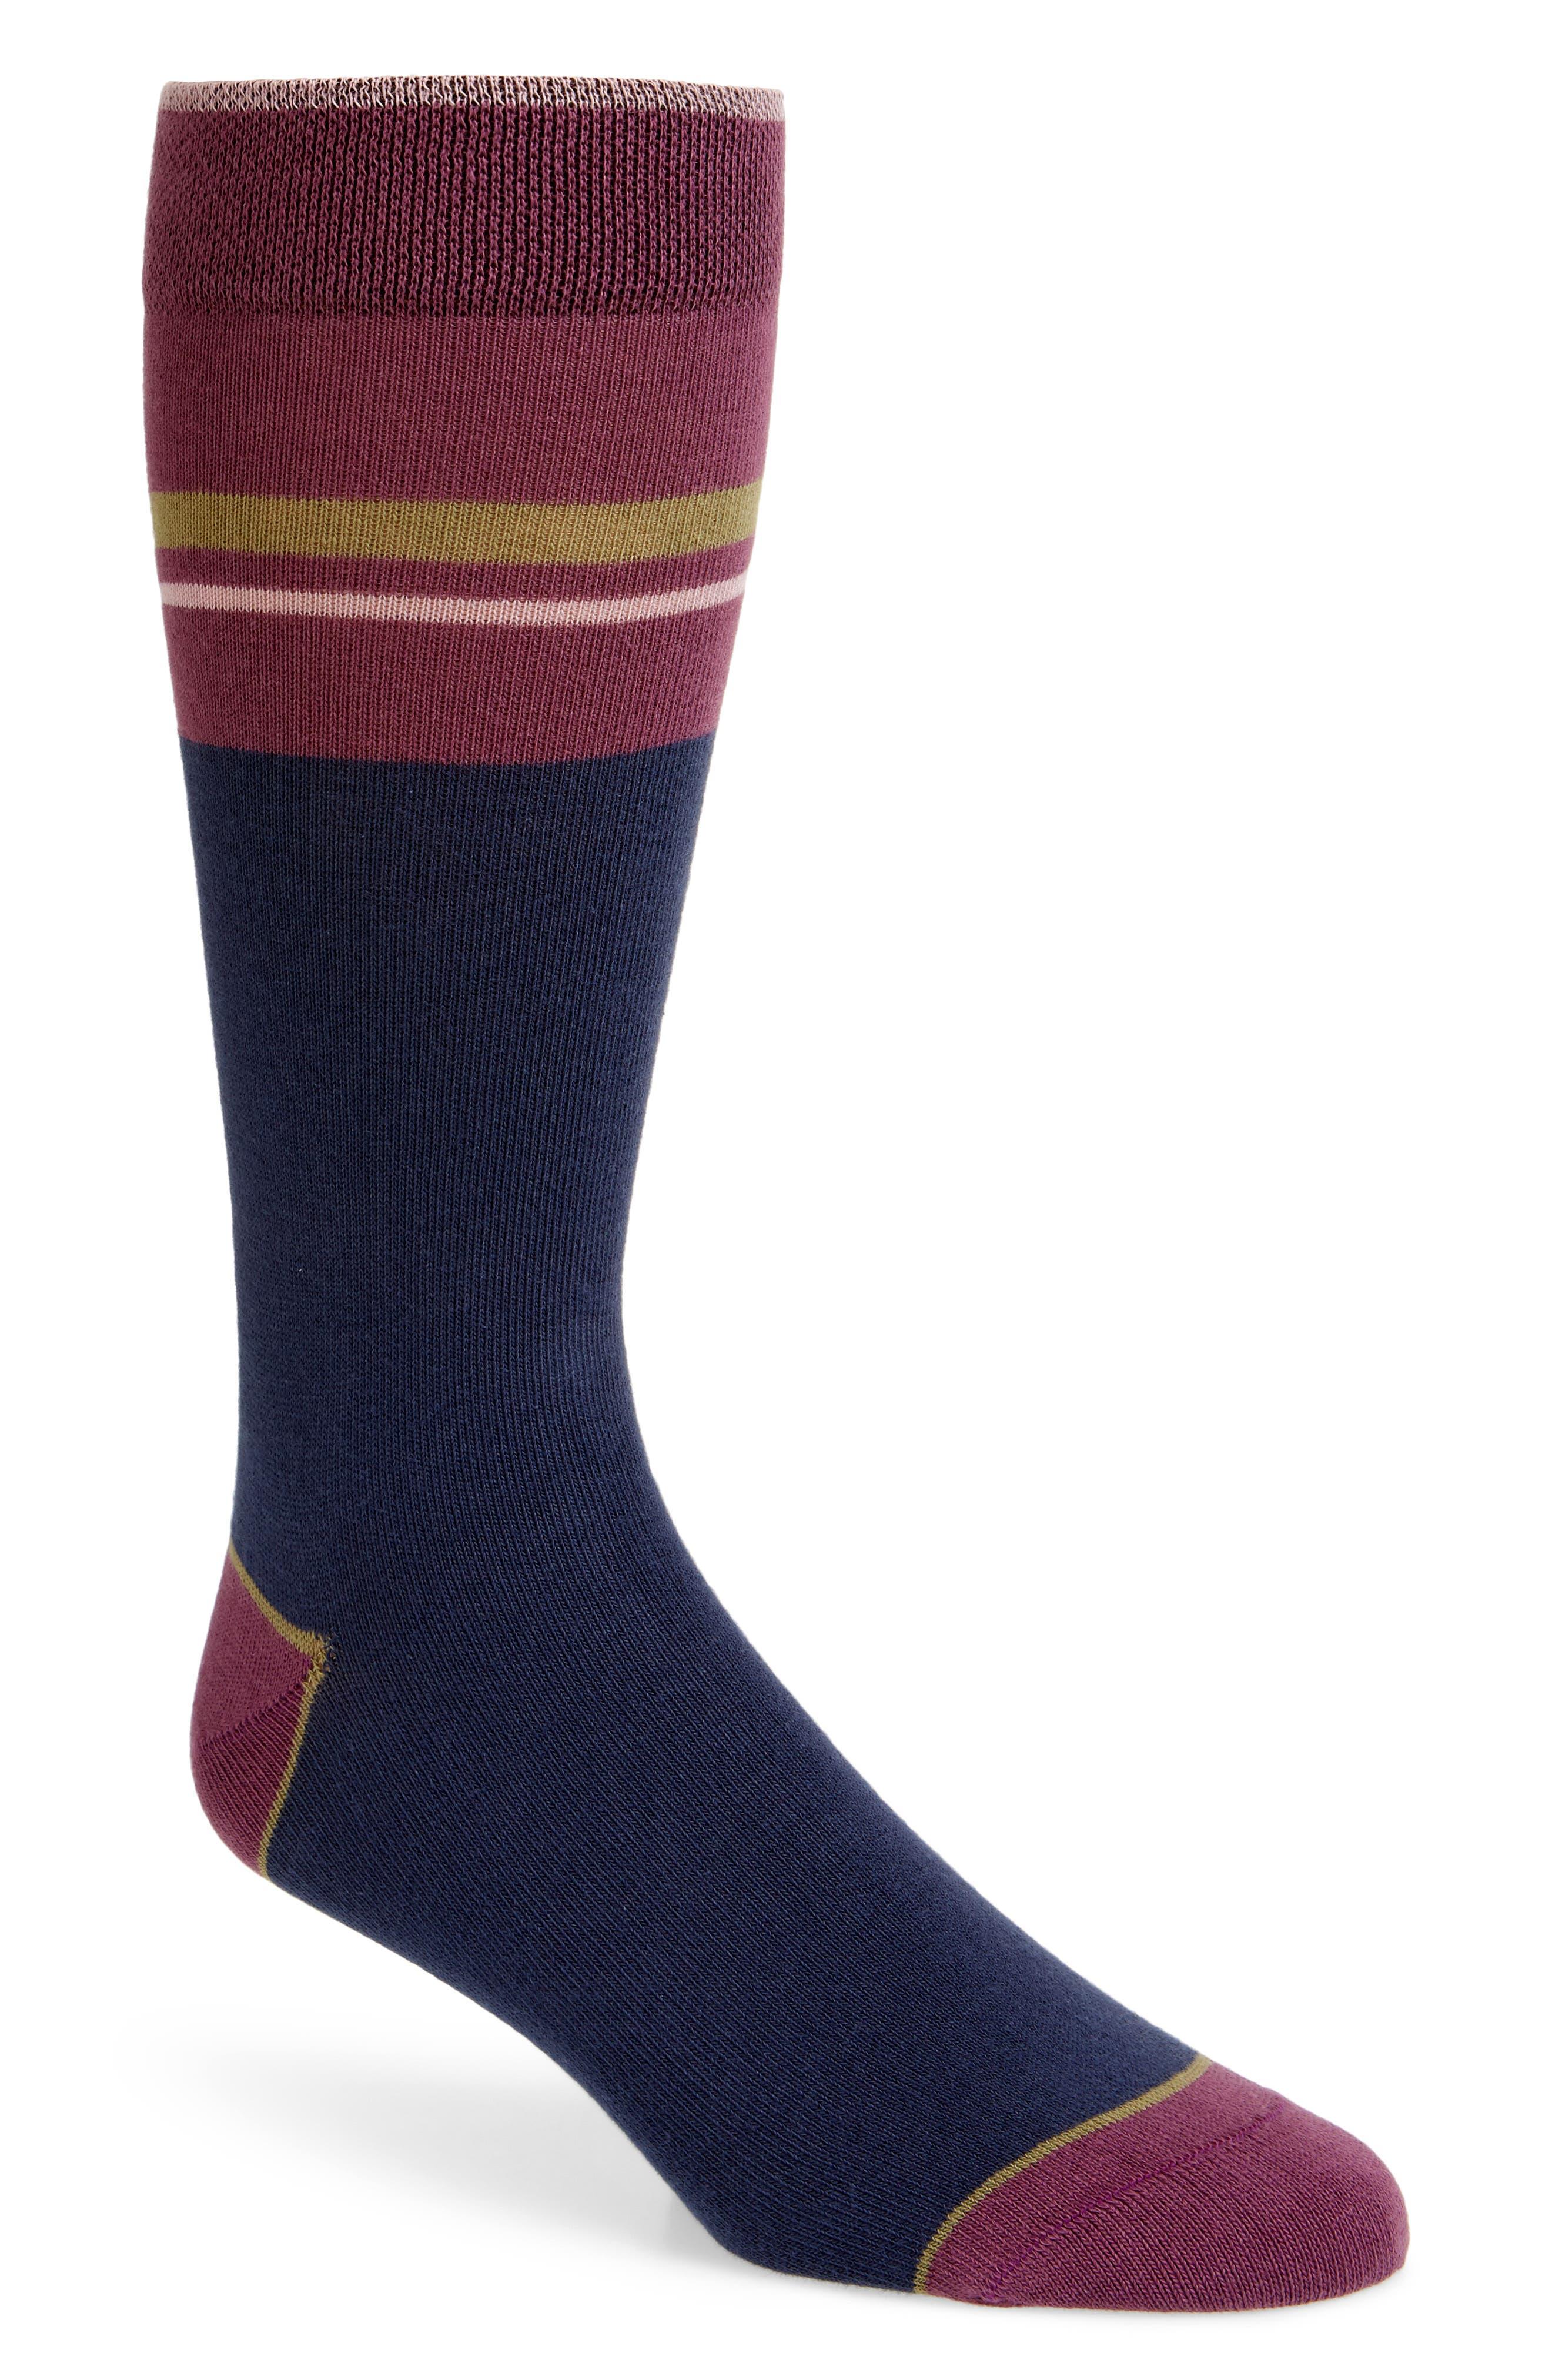 Amorpe Stripe Socks,                         Main,                         color, NAVY